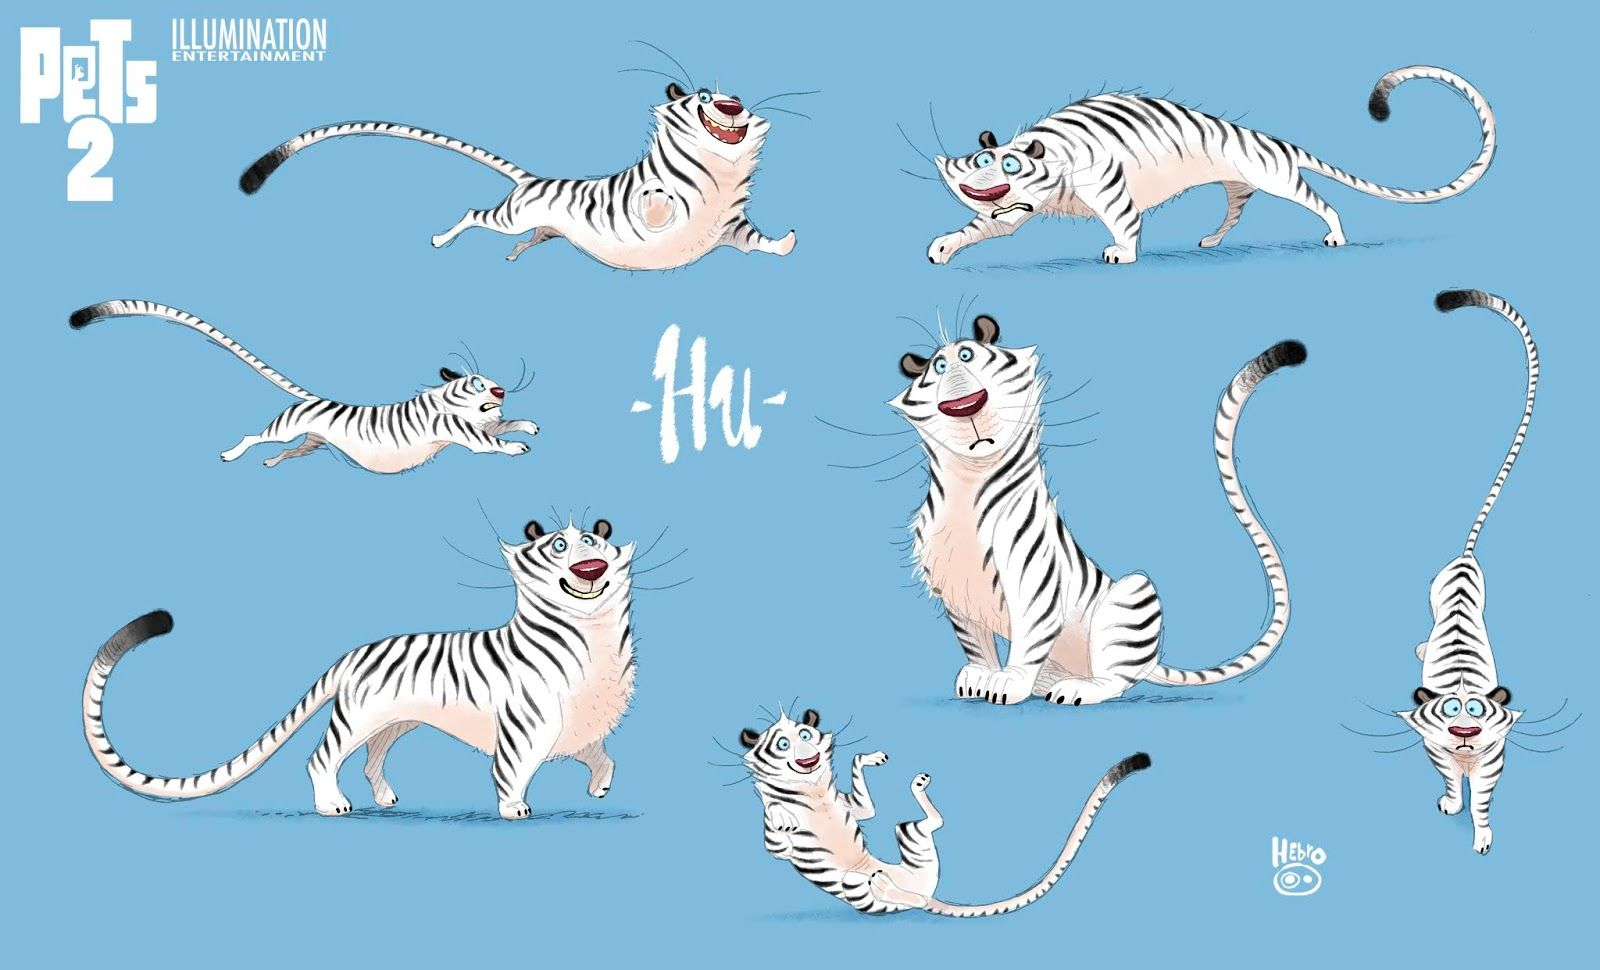 Character Designs Do Filme Pets 2 Por Daniel Fernandez Casas Thecab The Concept Art Blog In 2020 Secret Life Of Pets Character Design Pets